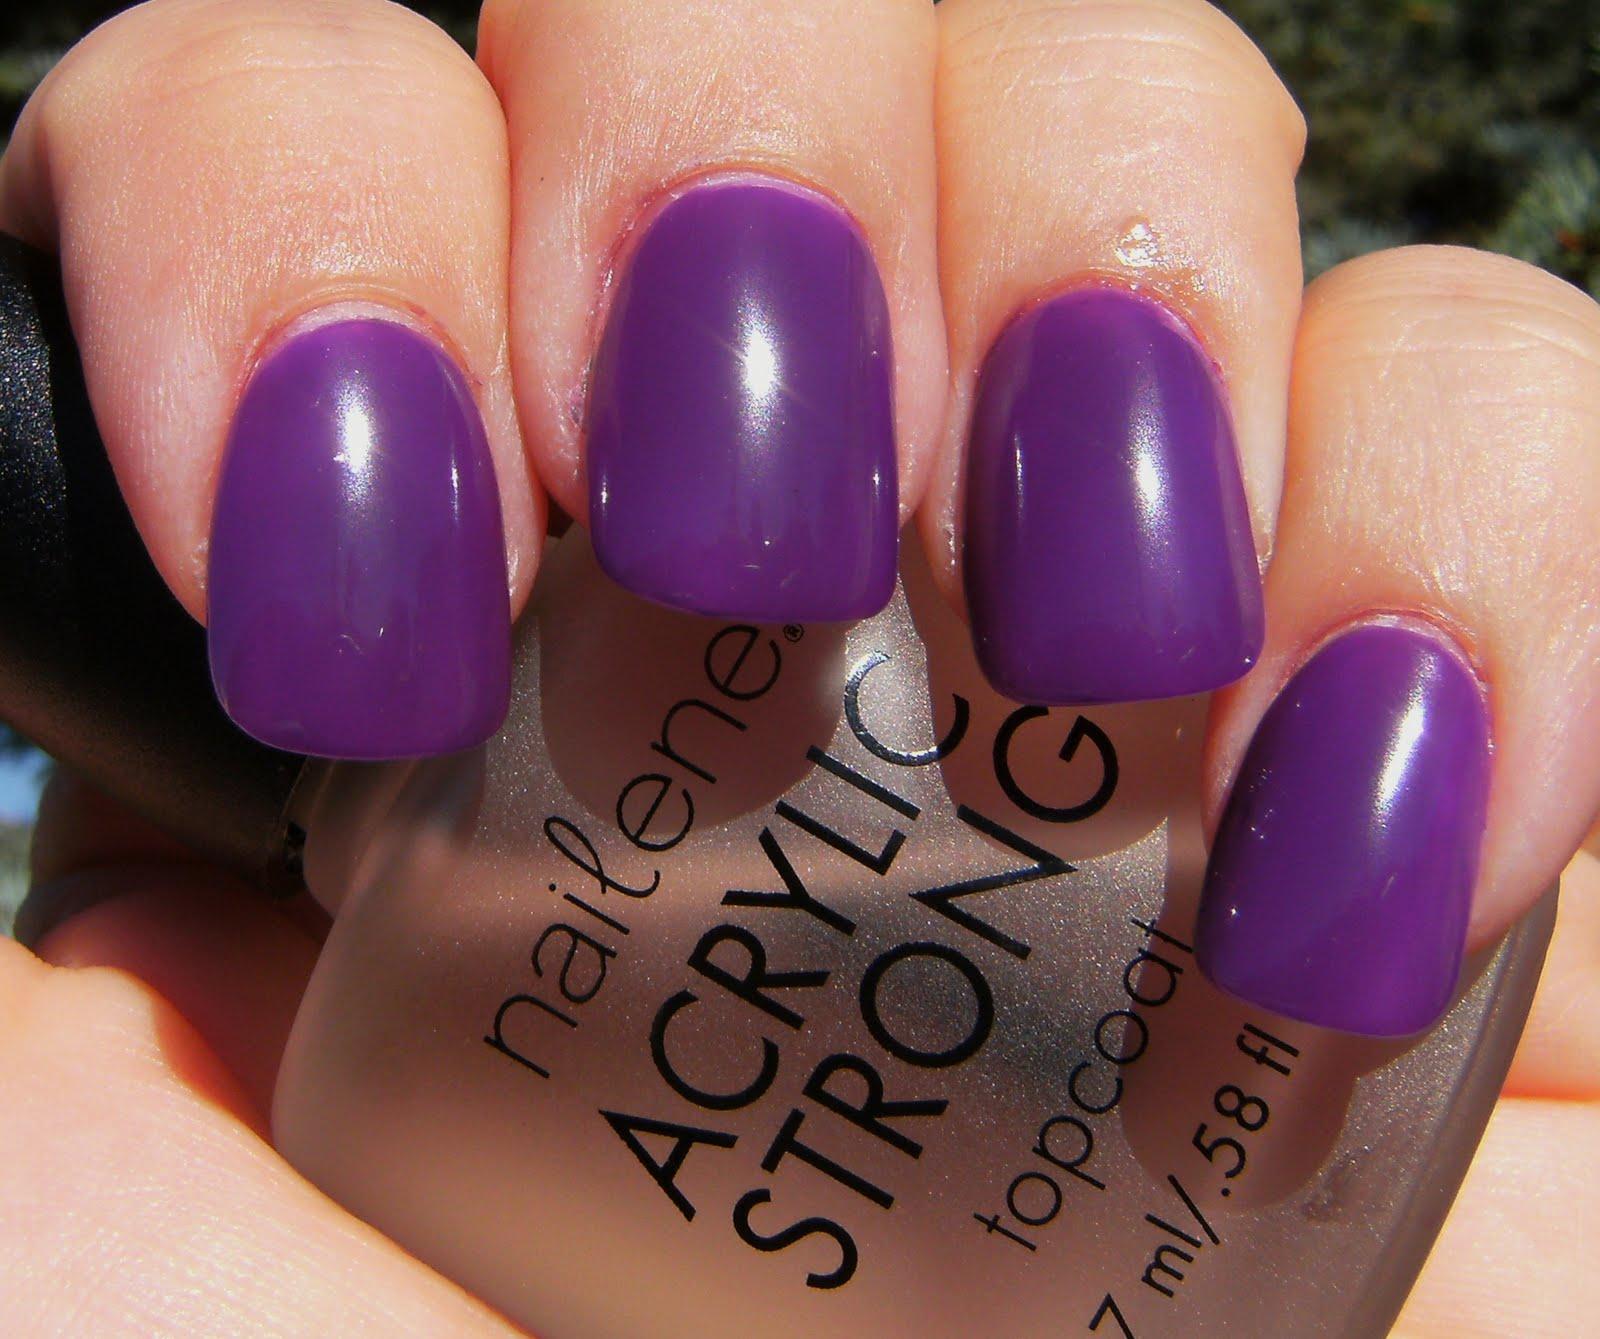 Deez Nailz: ♥ LA Colors Nuclear Energy with Love My Nails Diva ♥